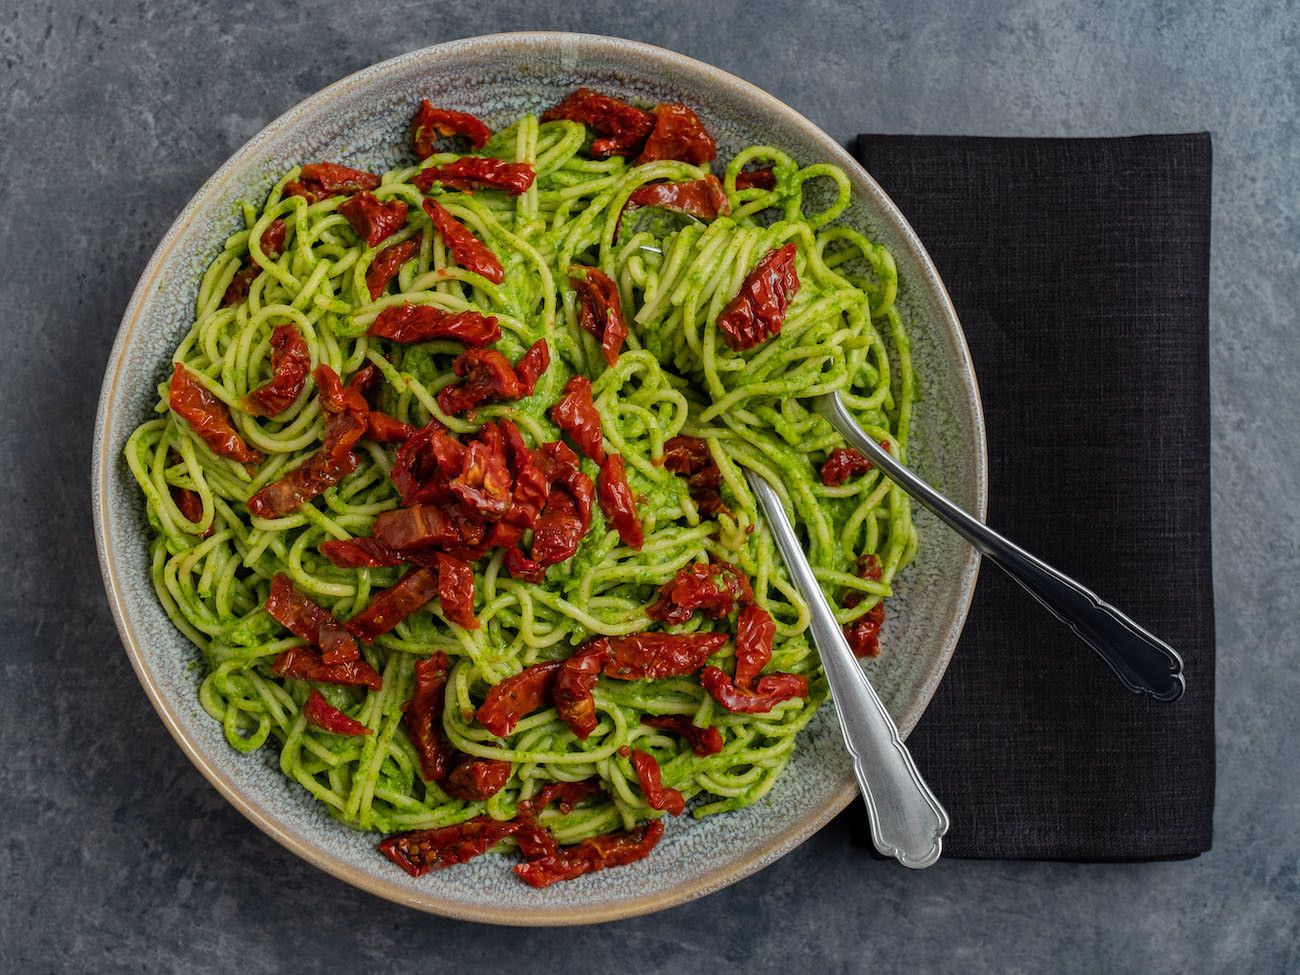 Foodblog, Rezept Spaghetti mit Avocado-Rucola-Pesto und getrockenten Tomaten, Tekler, Besteck